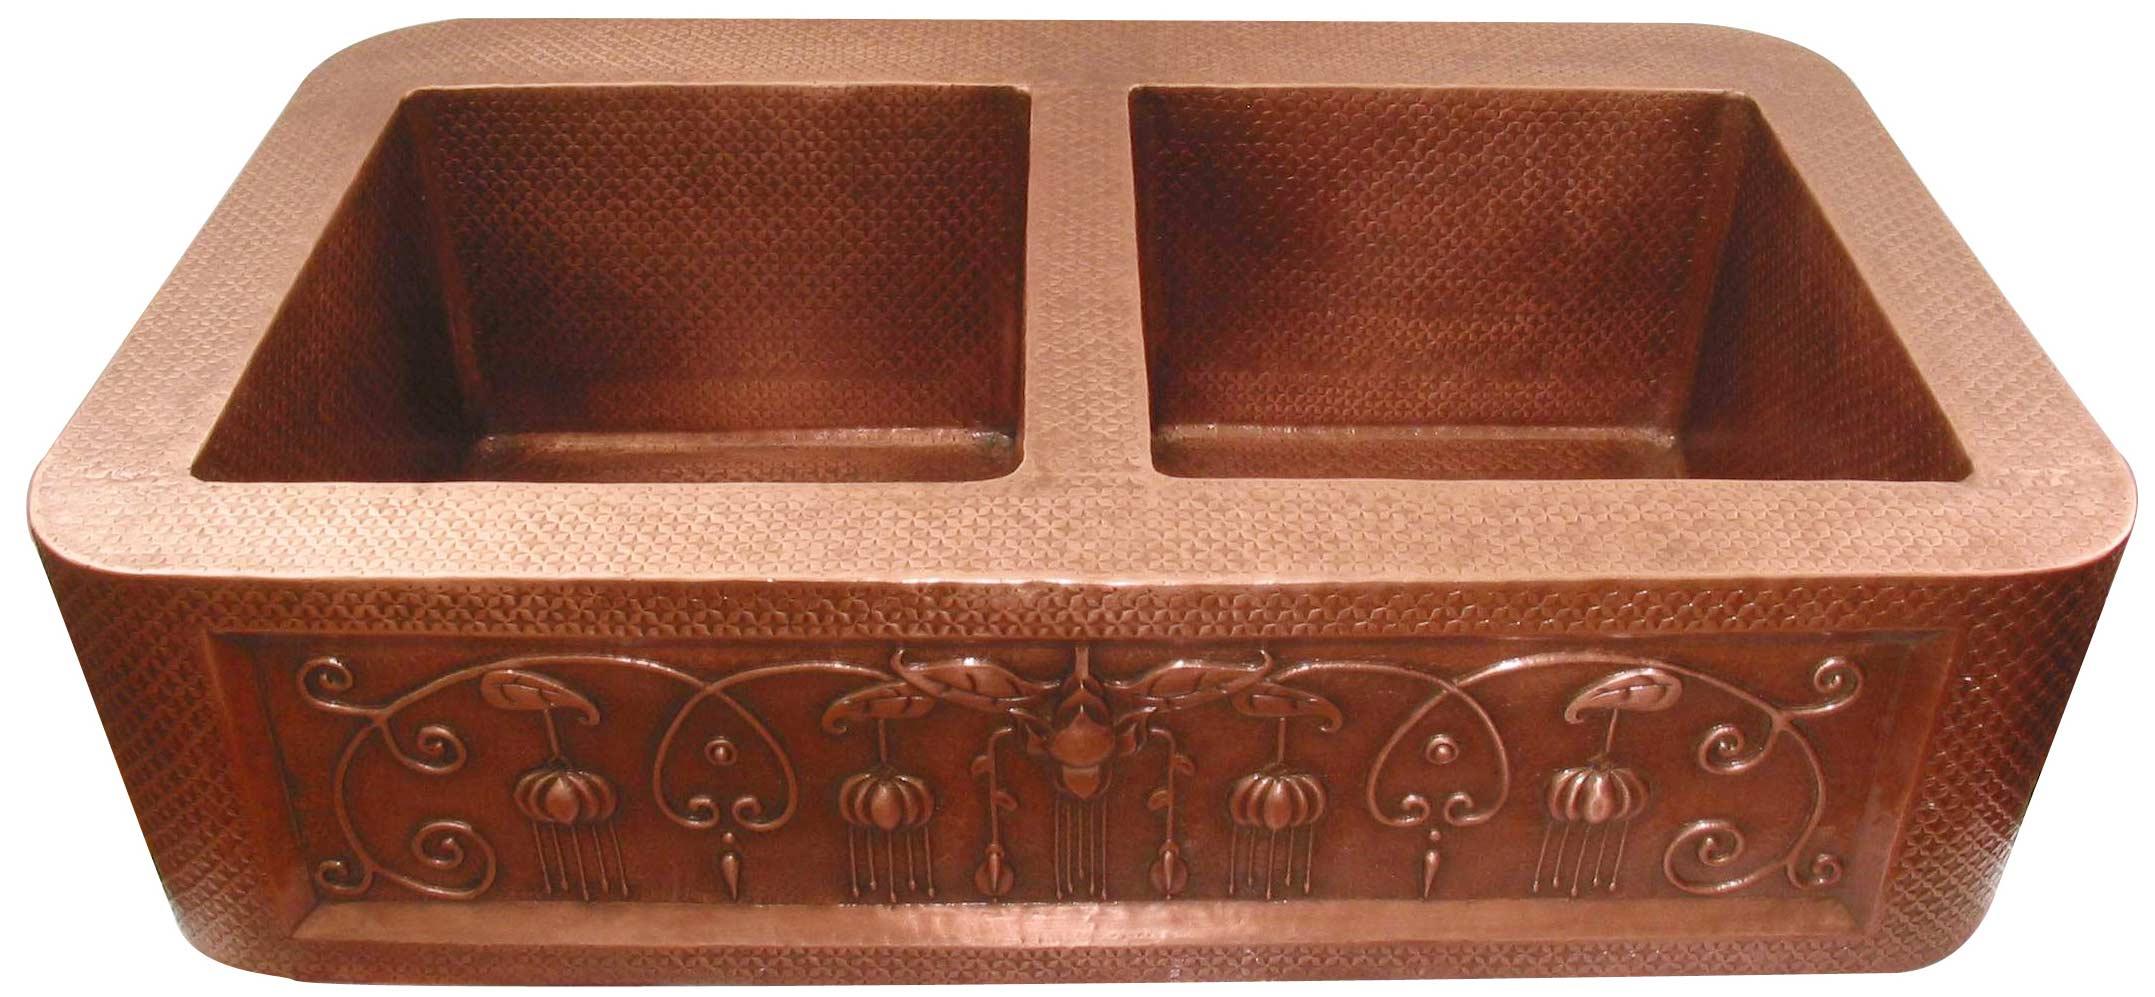 copper sinks mexican style apron kitchen copper sinks bathroom copper